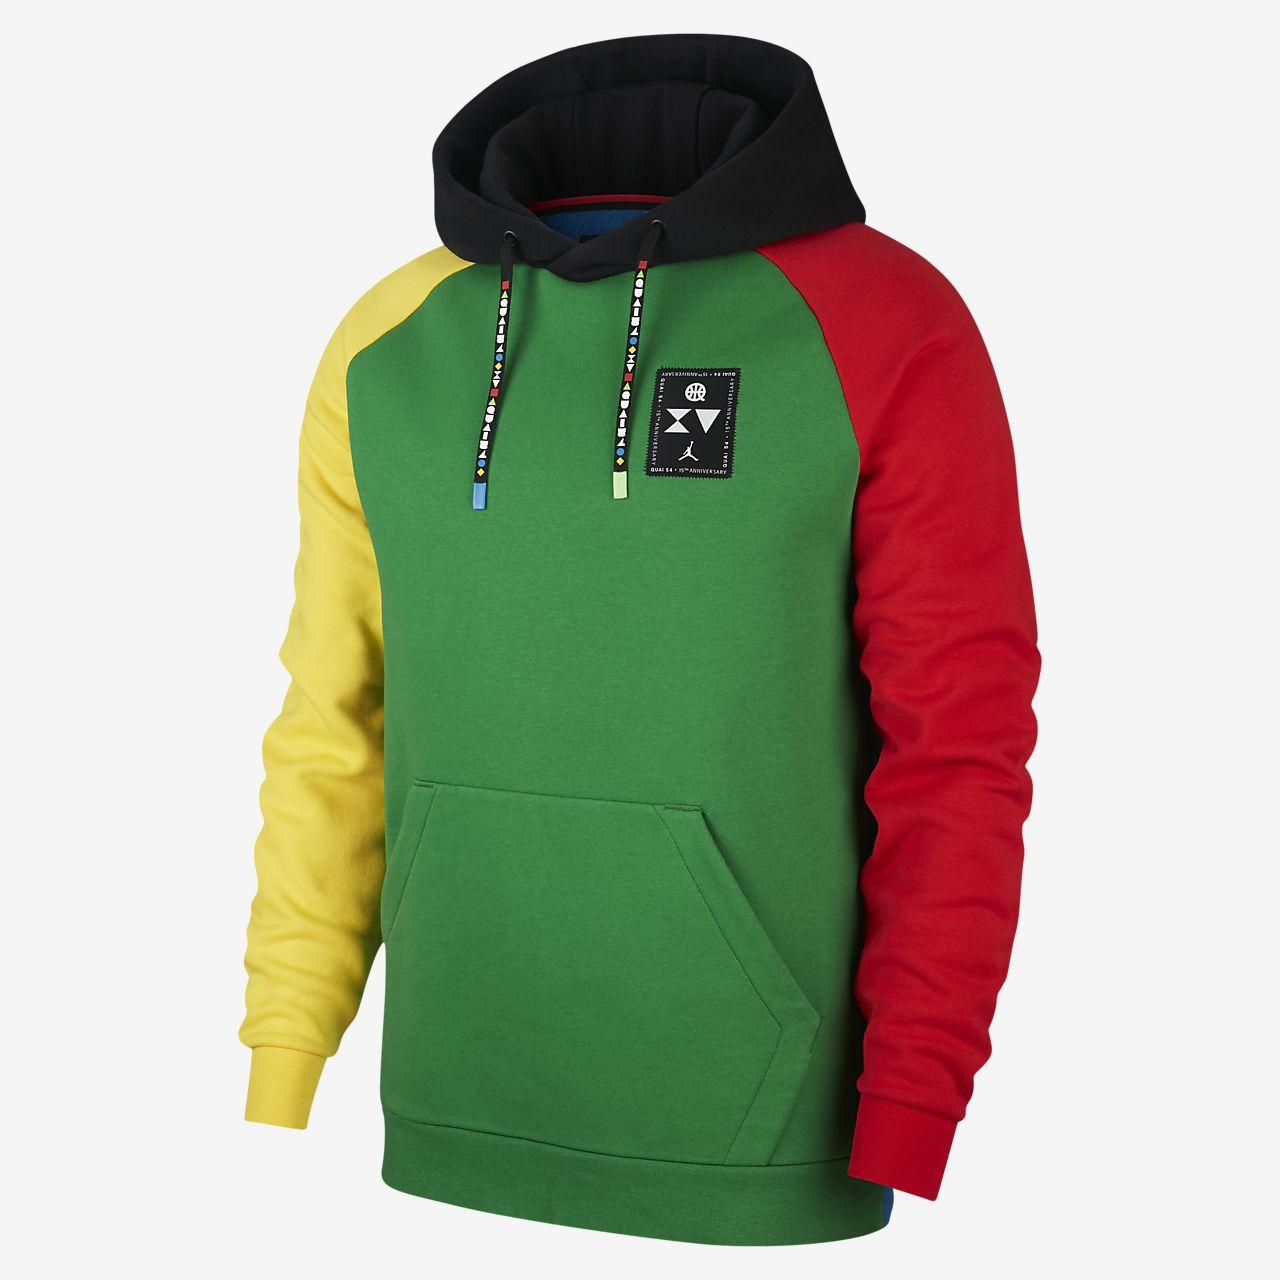 Maglia in fleece Jordan Quai 54 Pullover - Uomo